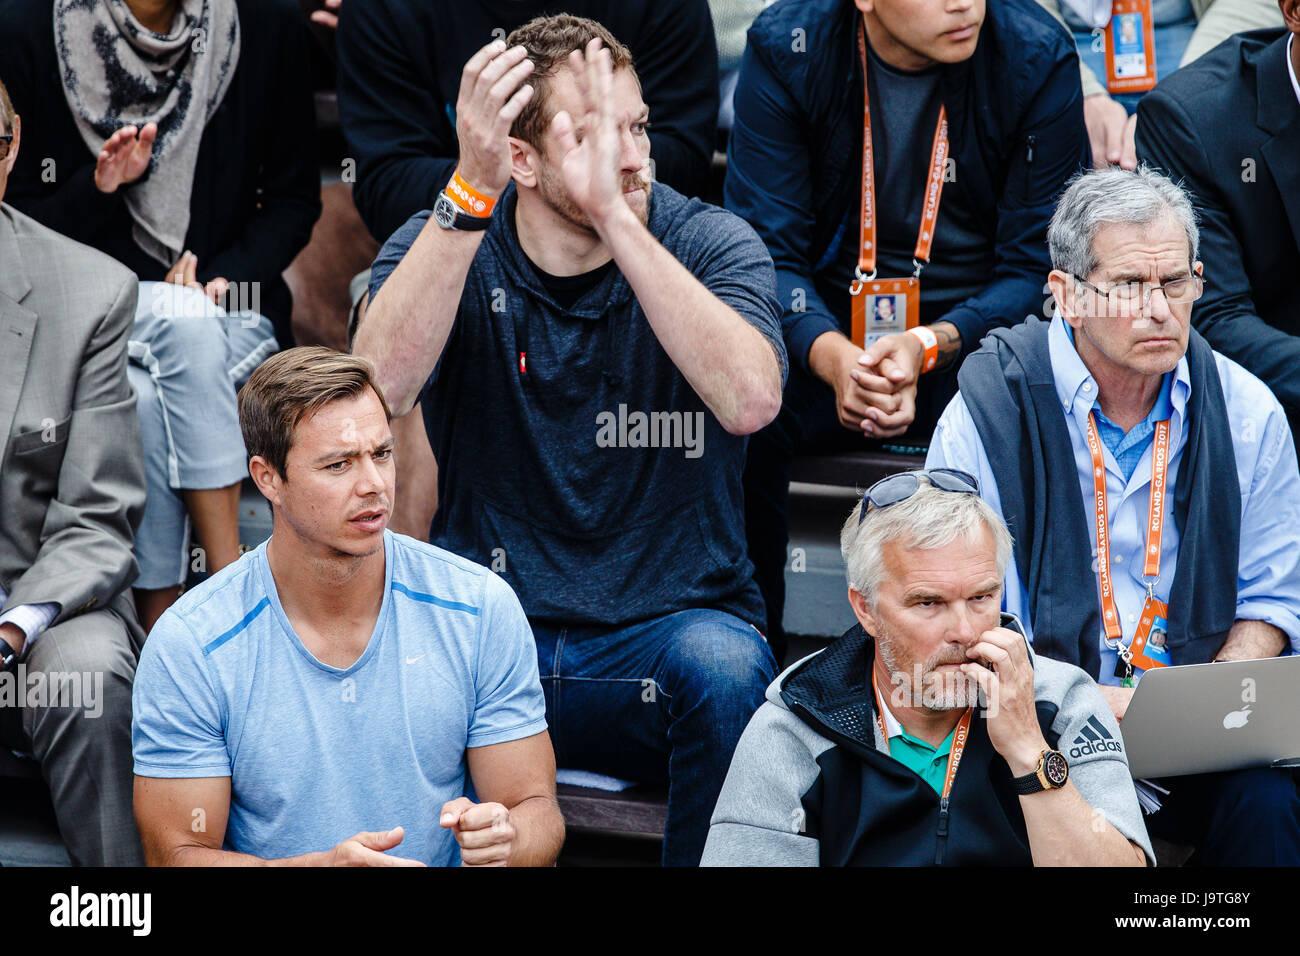 Paris, France, June 3rd 2017: US-Basketball-Pro David Lee during the 3rd round match of danish player Caroline Wozniacki Stock Photo